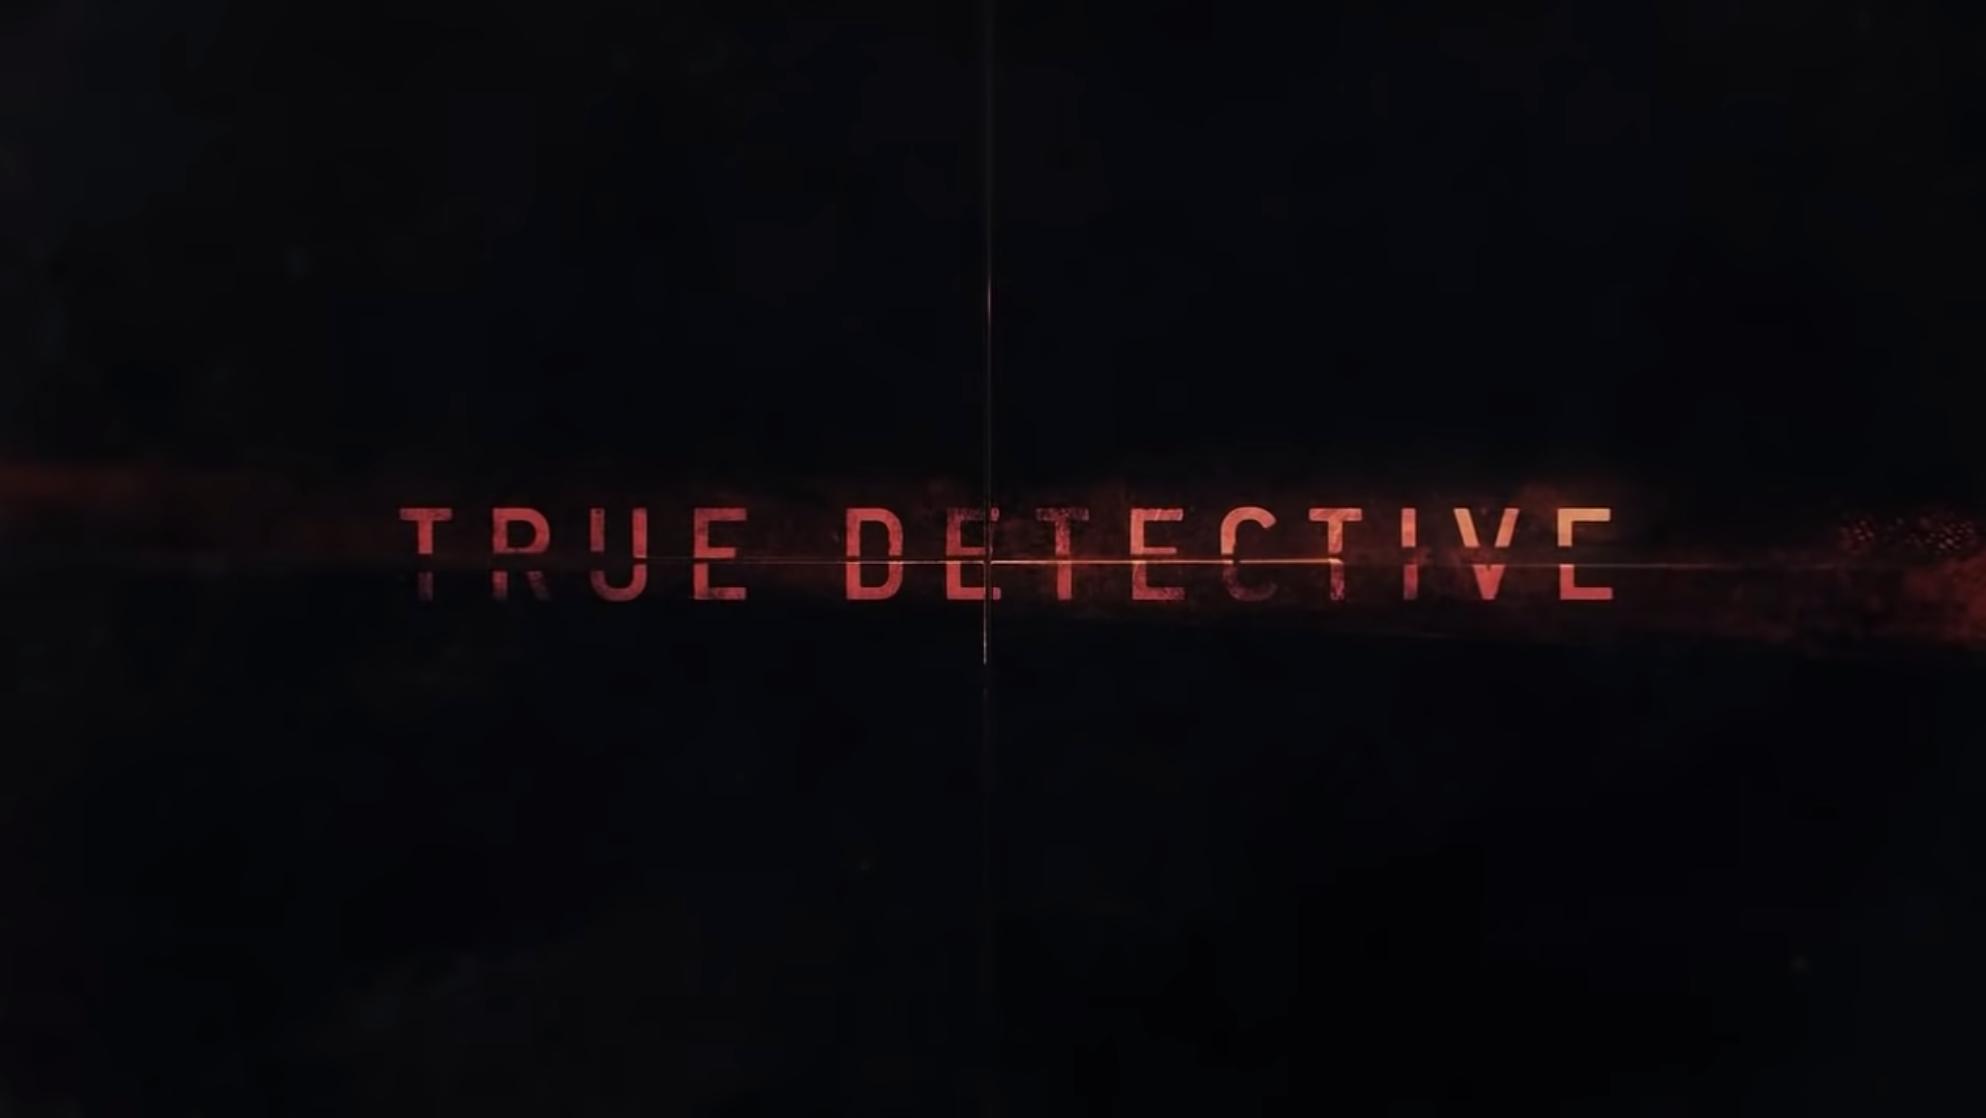 """True Detective"" title card."